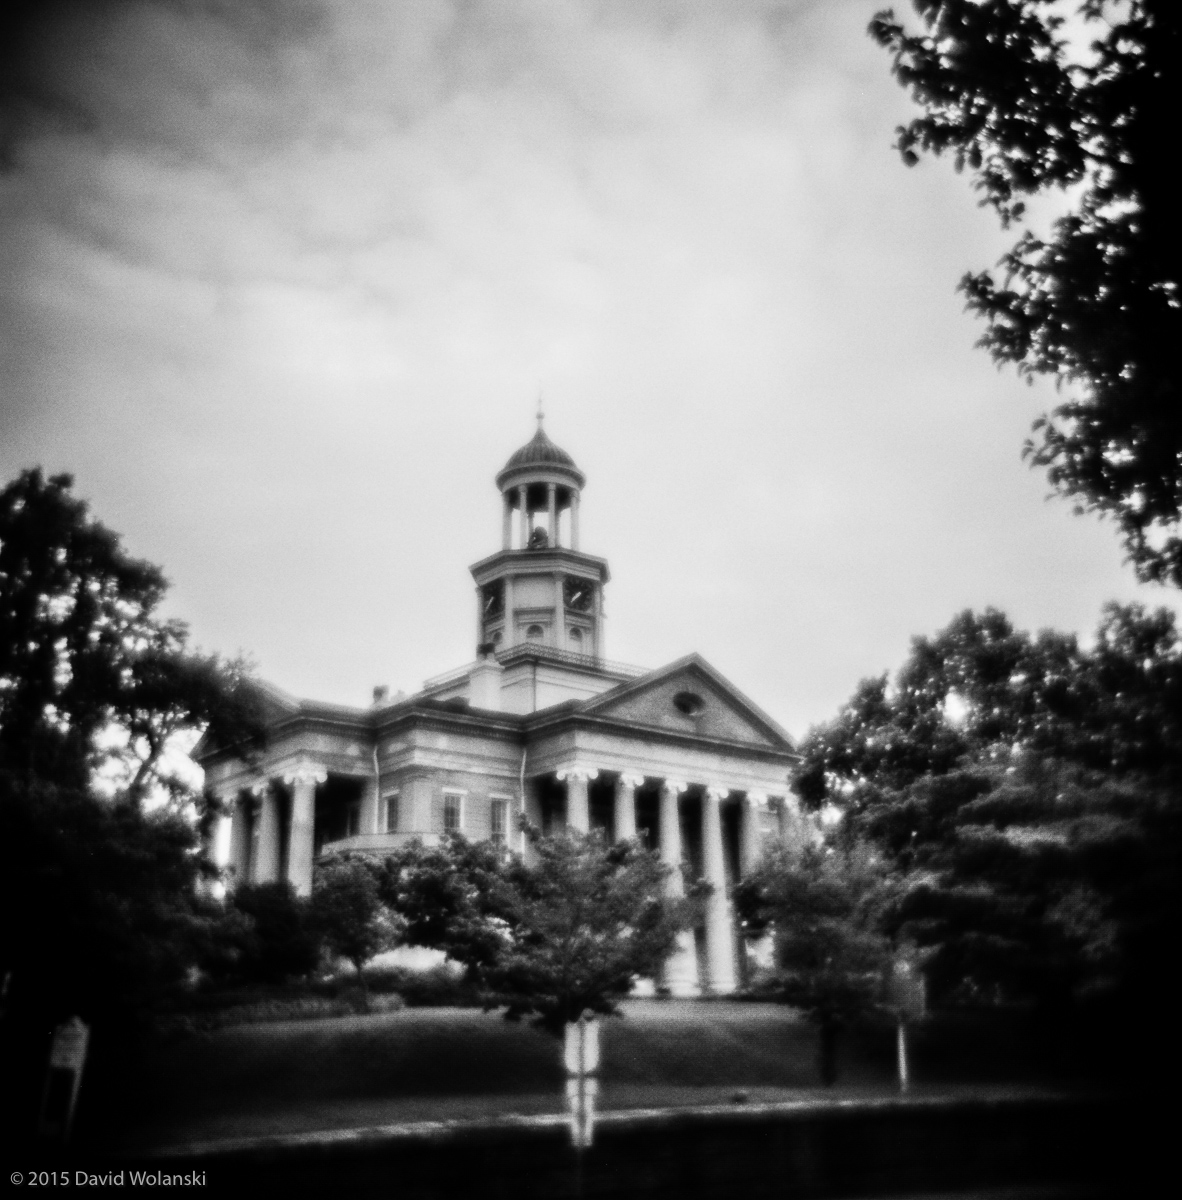 County Courthouse Vicksburg, MS